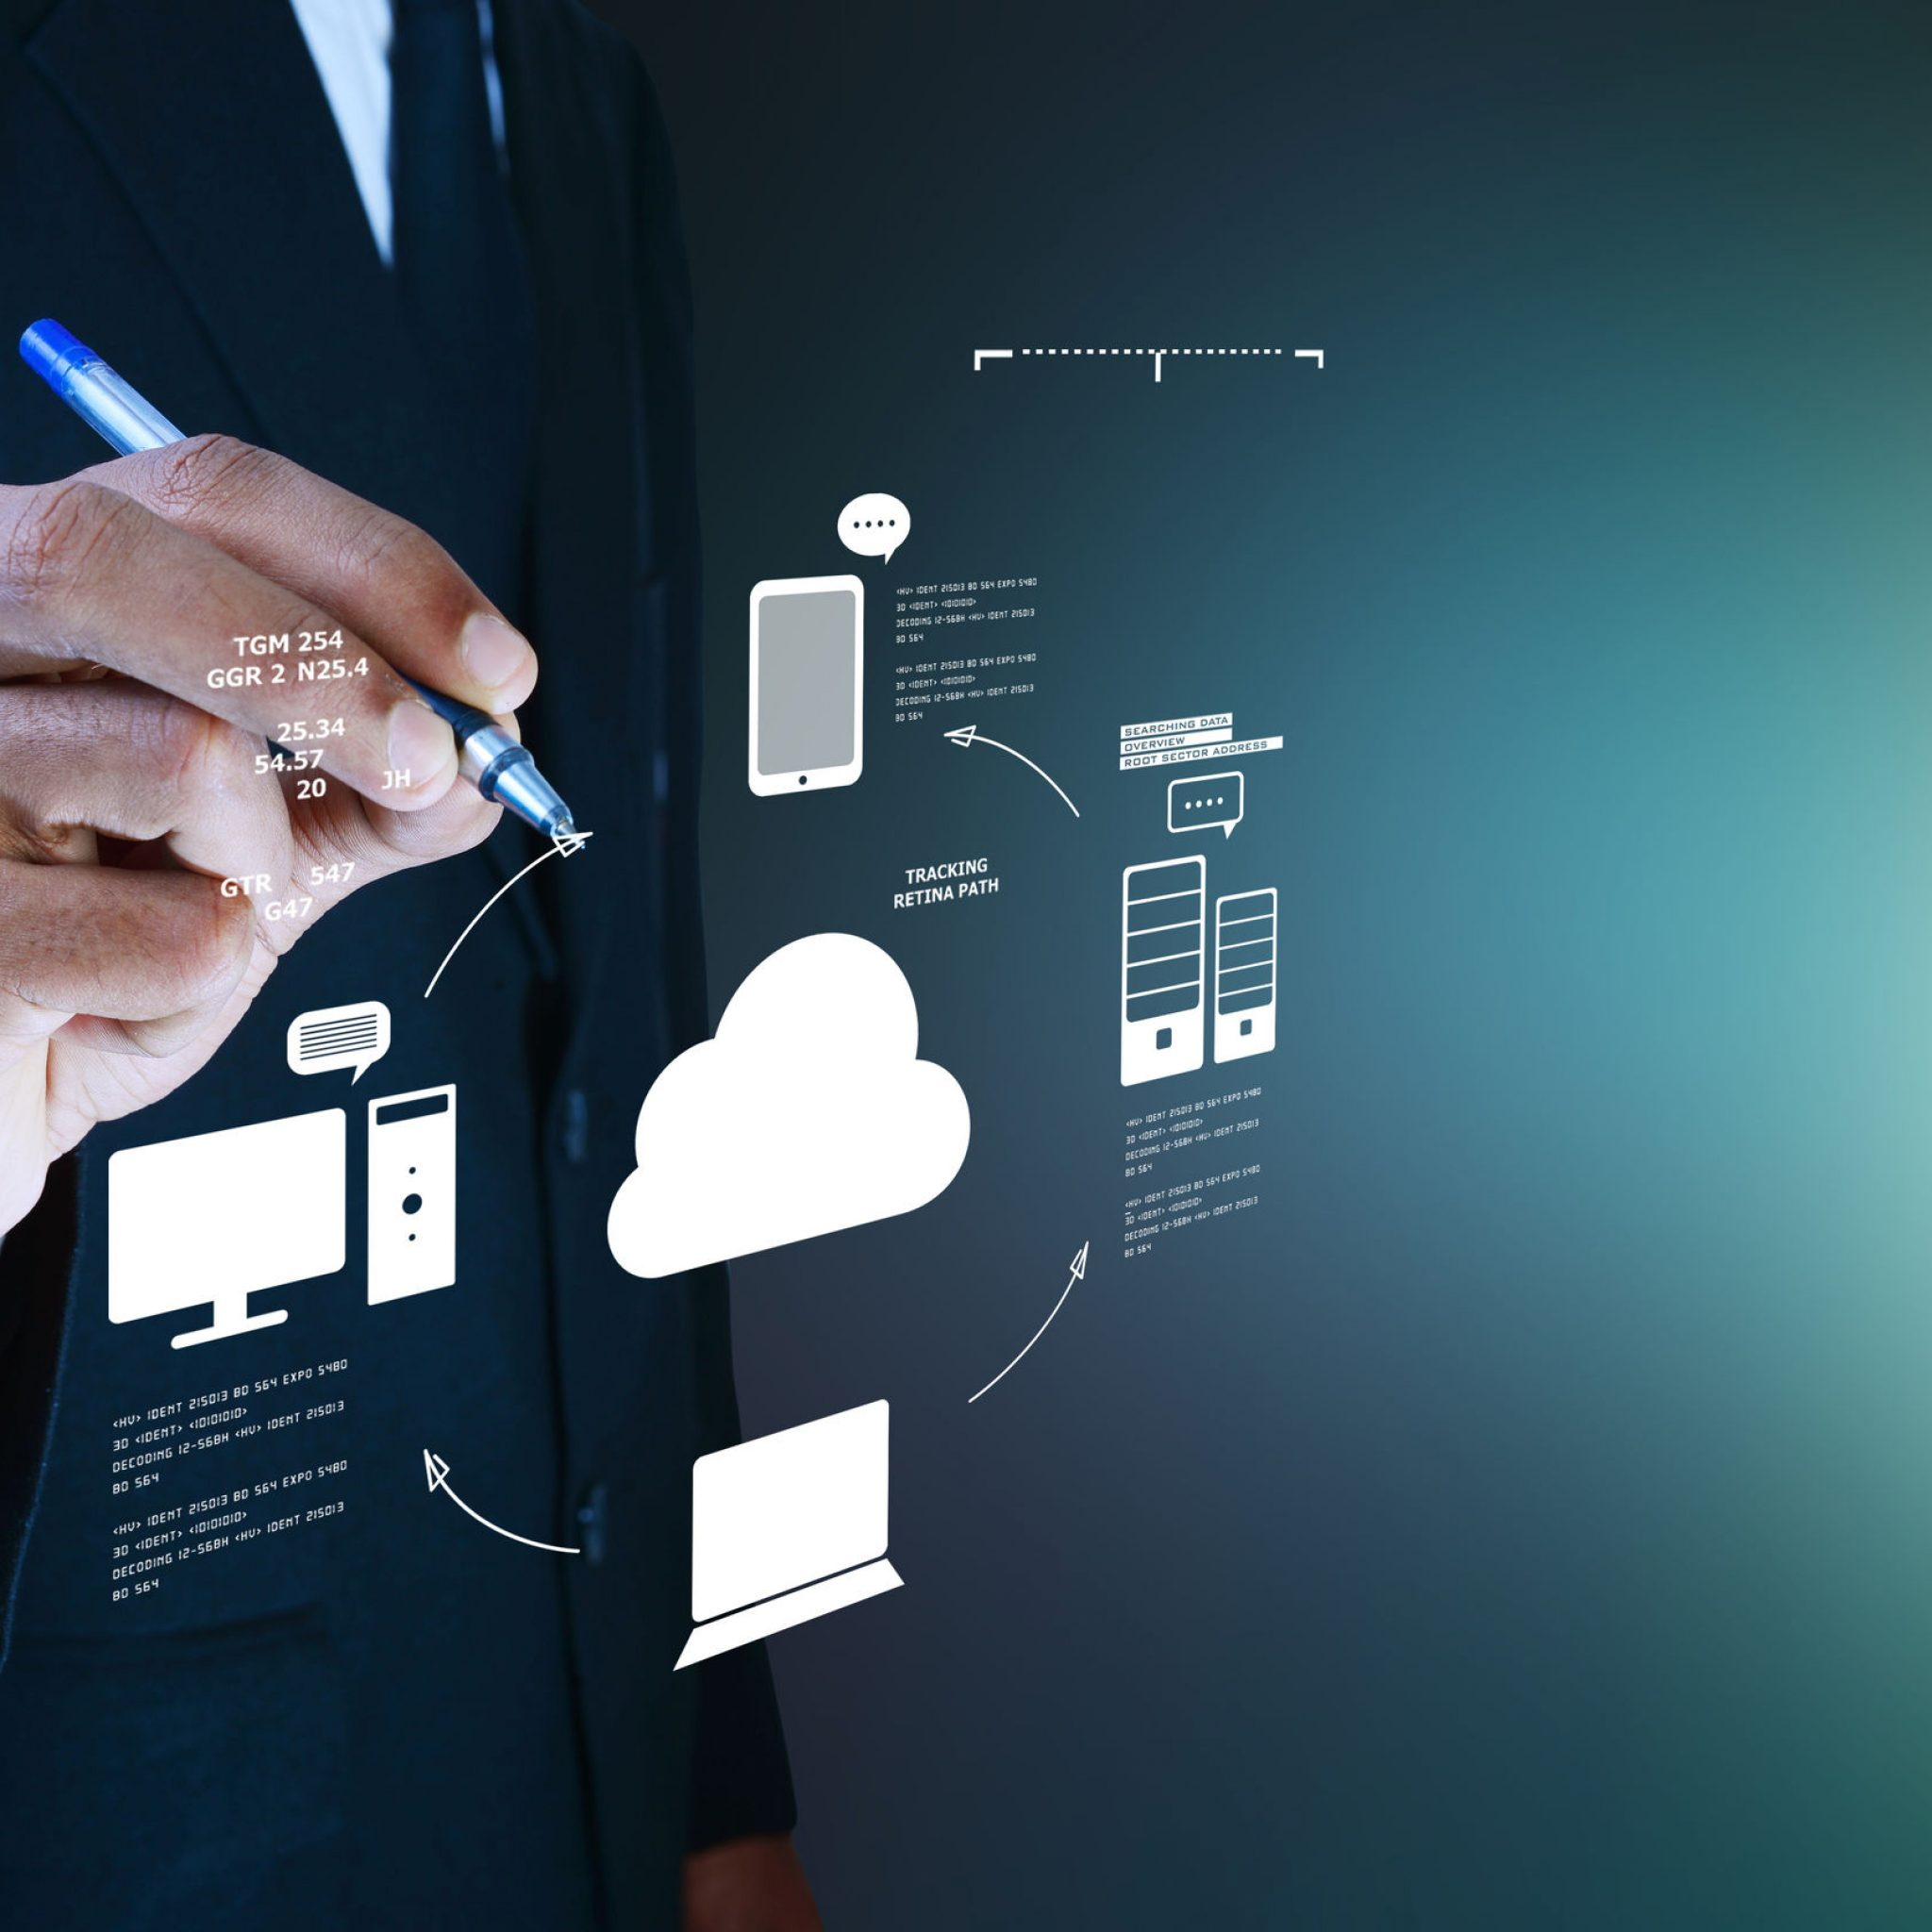 Cloud computing 101: Advantages and disadvantages